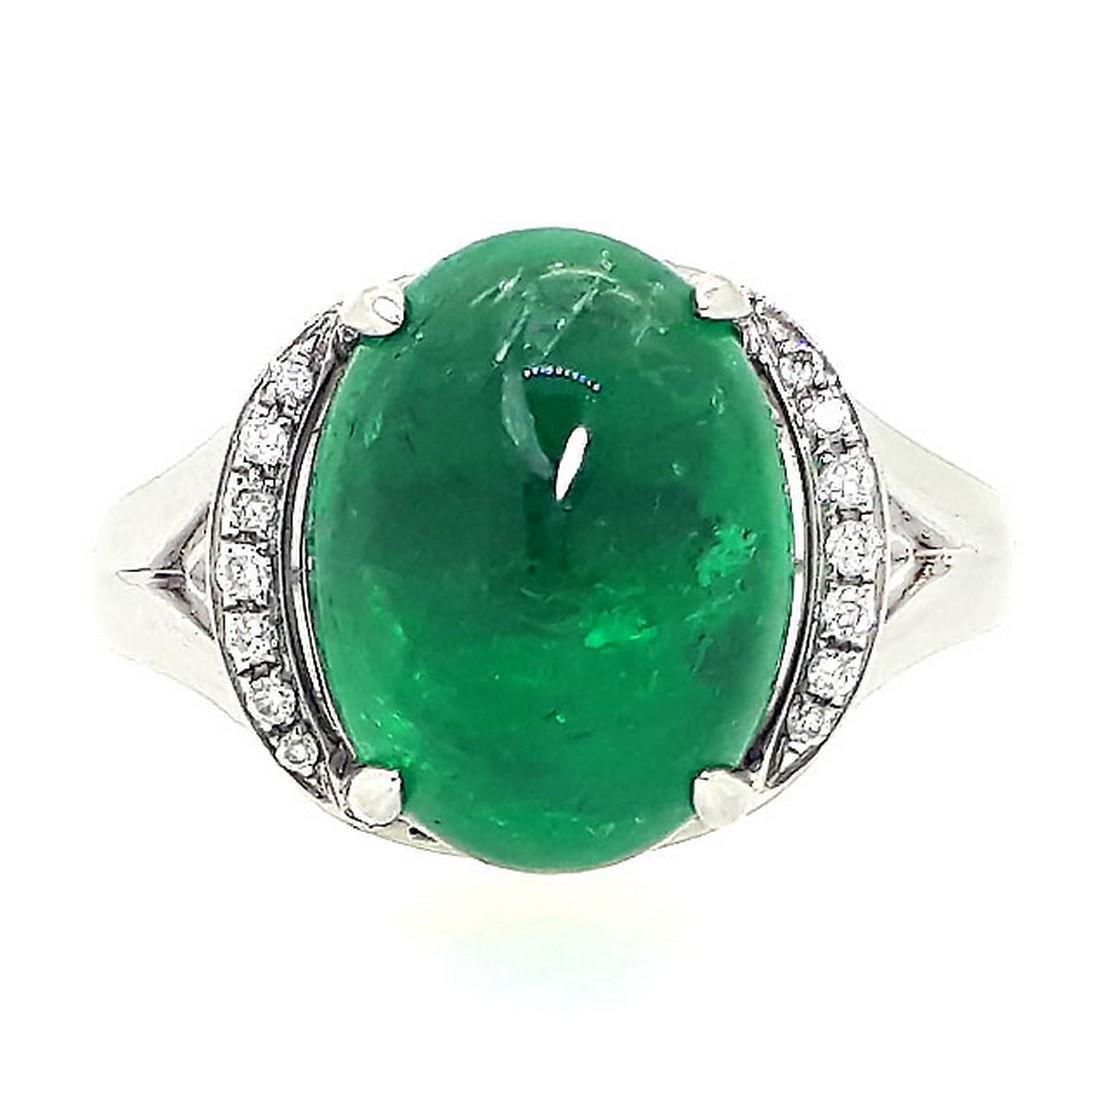 5.47 g 18k White Gold Emerald Diamond Ring